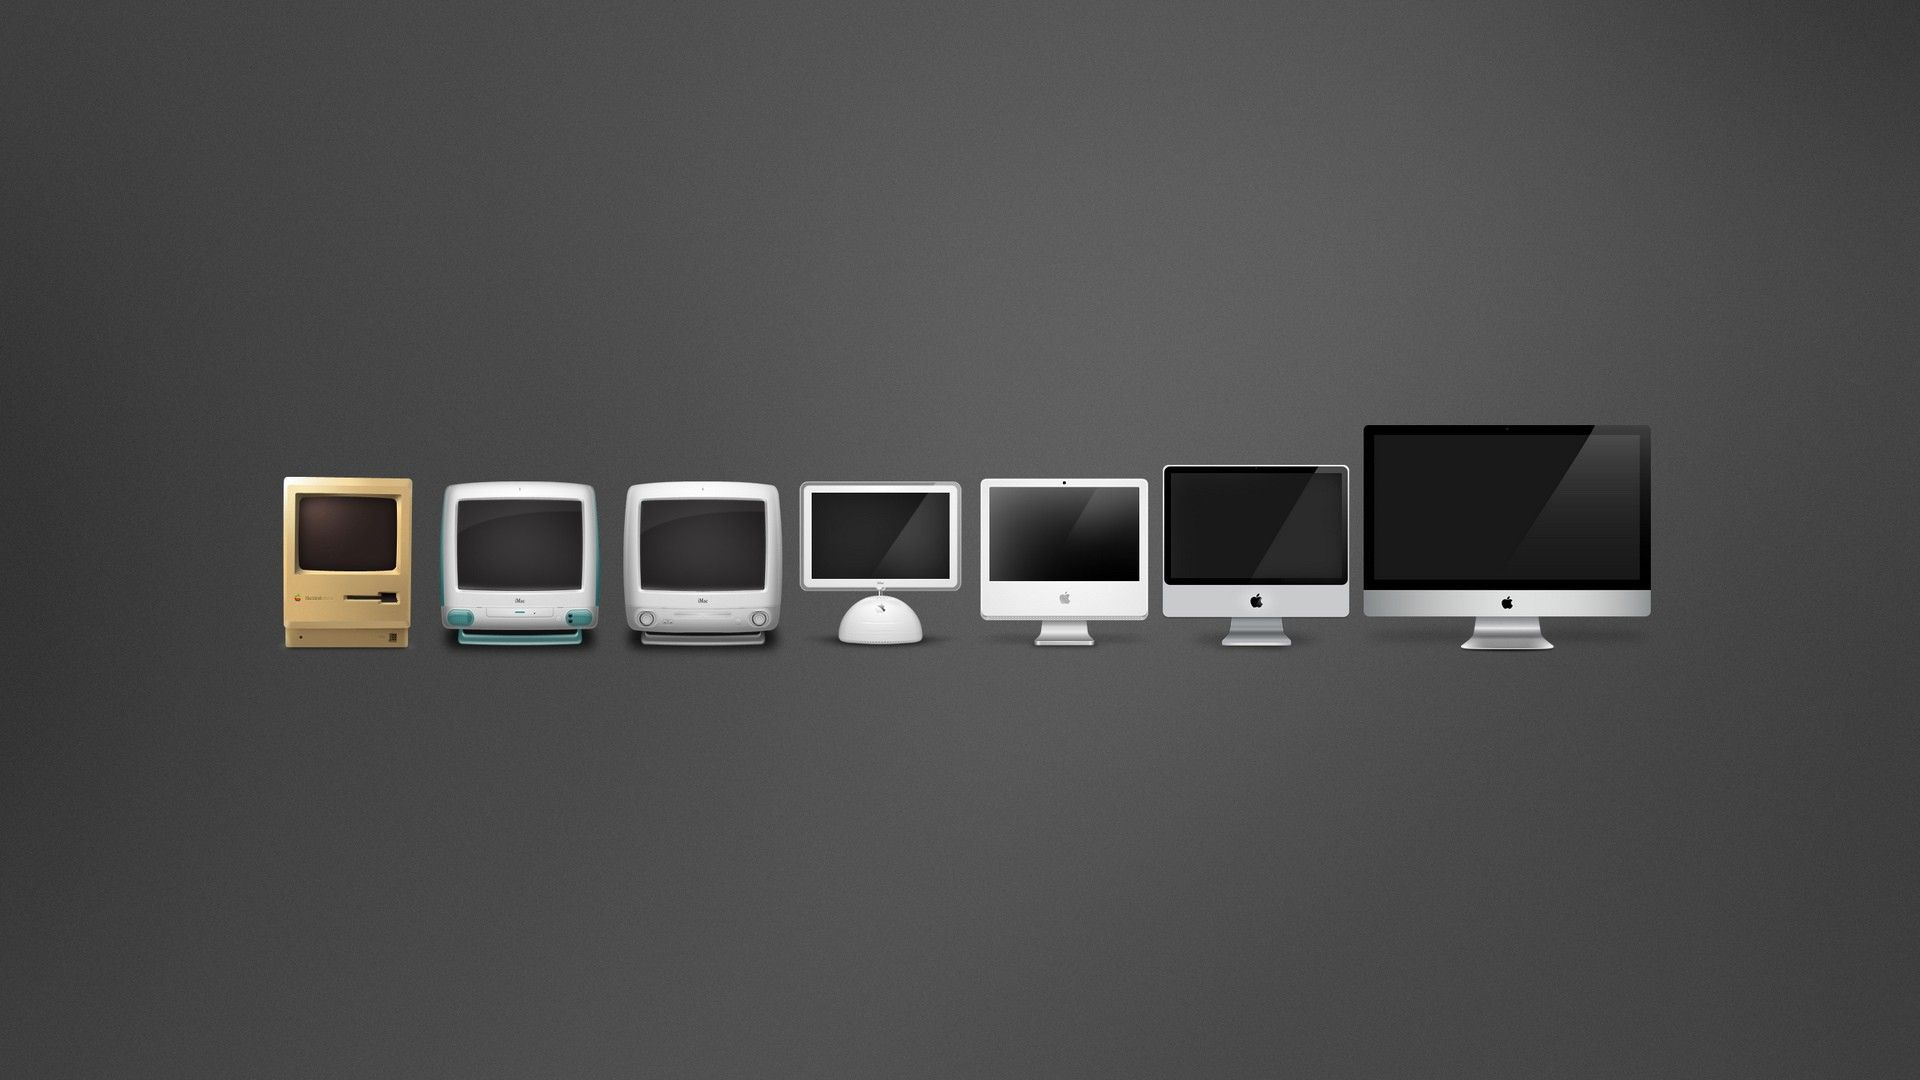 Evolution Garbage Comparisons Macintosh Wallpaper  Wallbase Cc